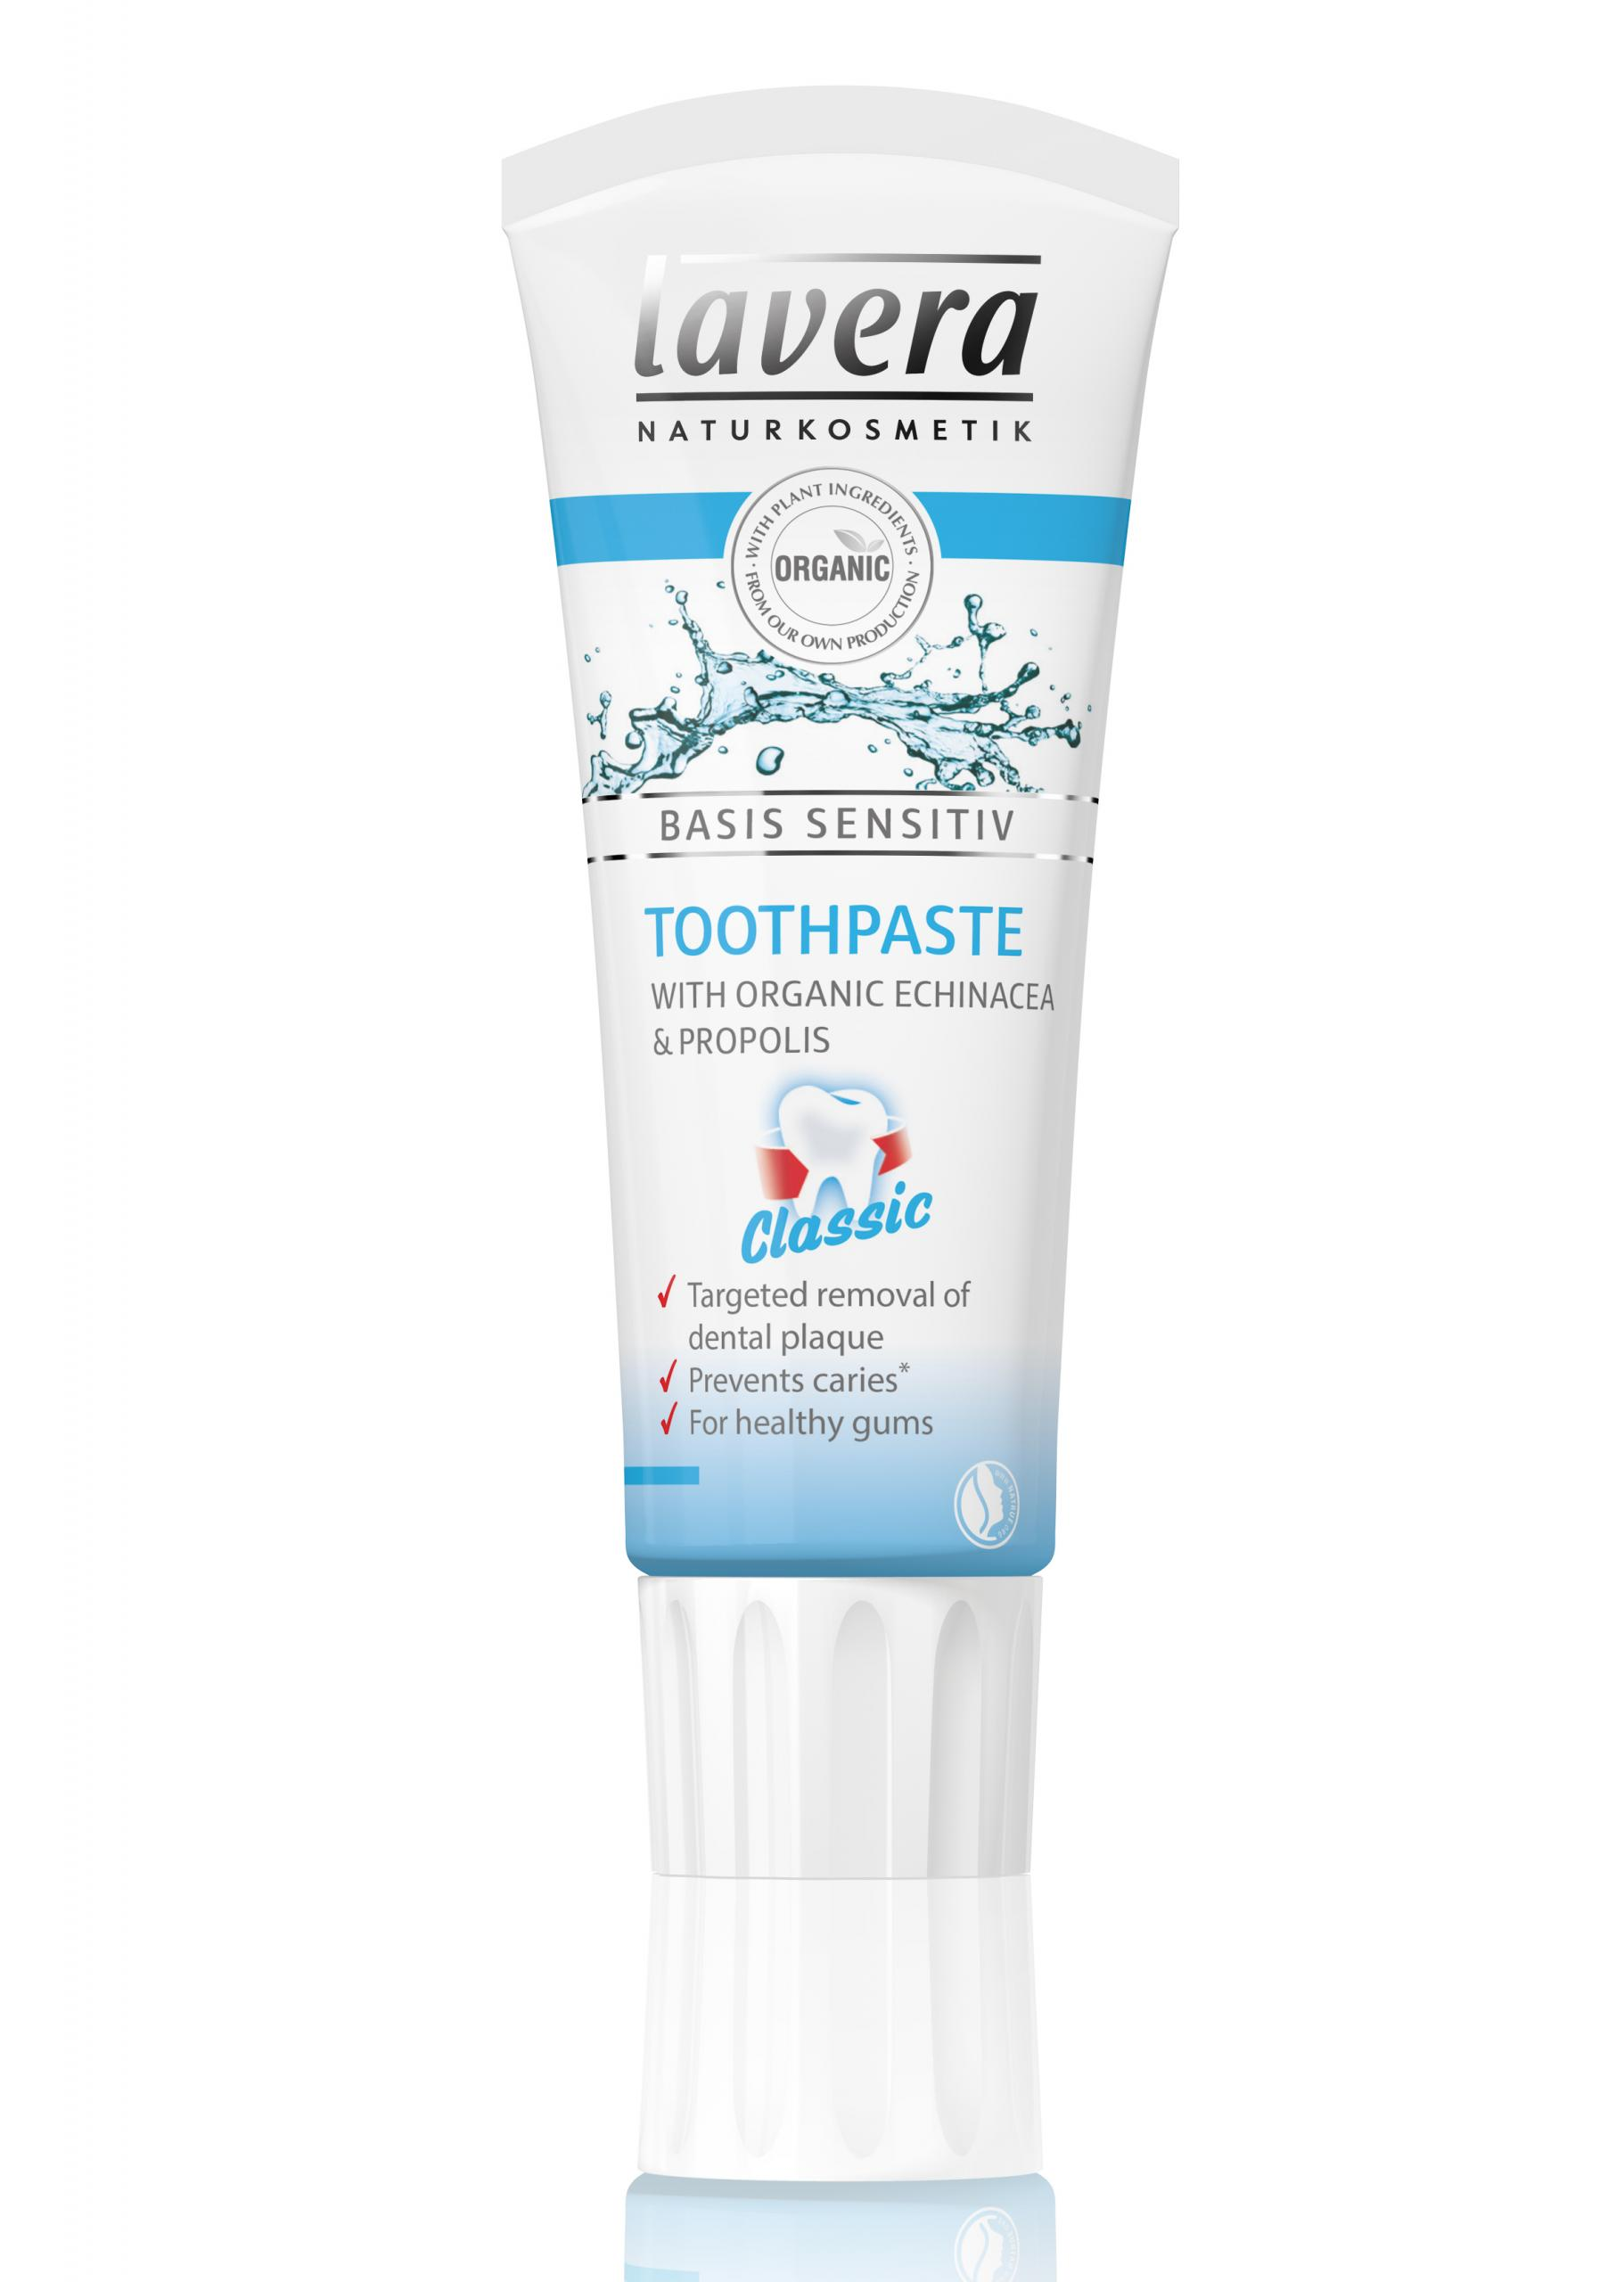 Lavera Basis Toothpaste_Classic